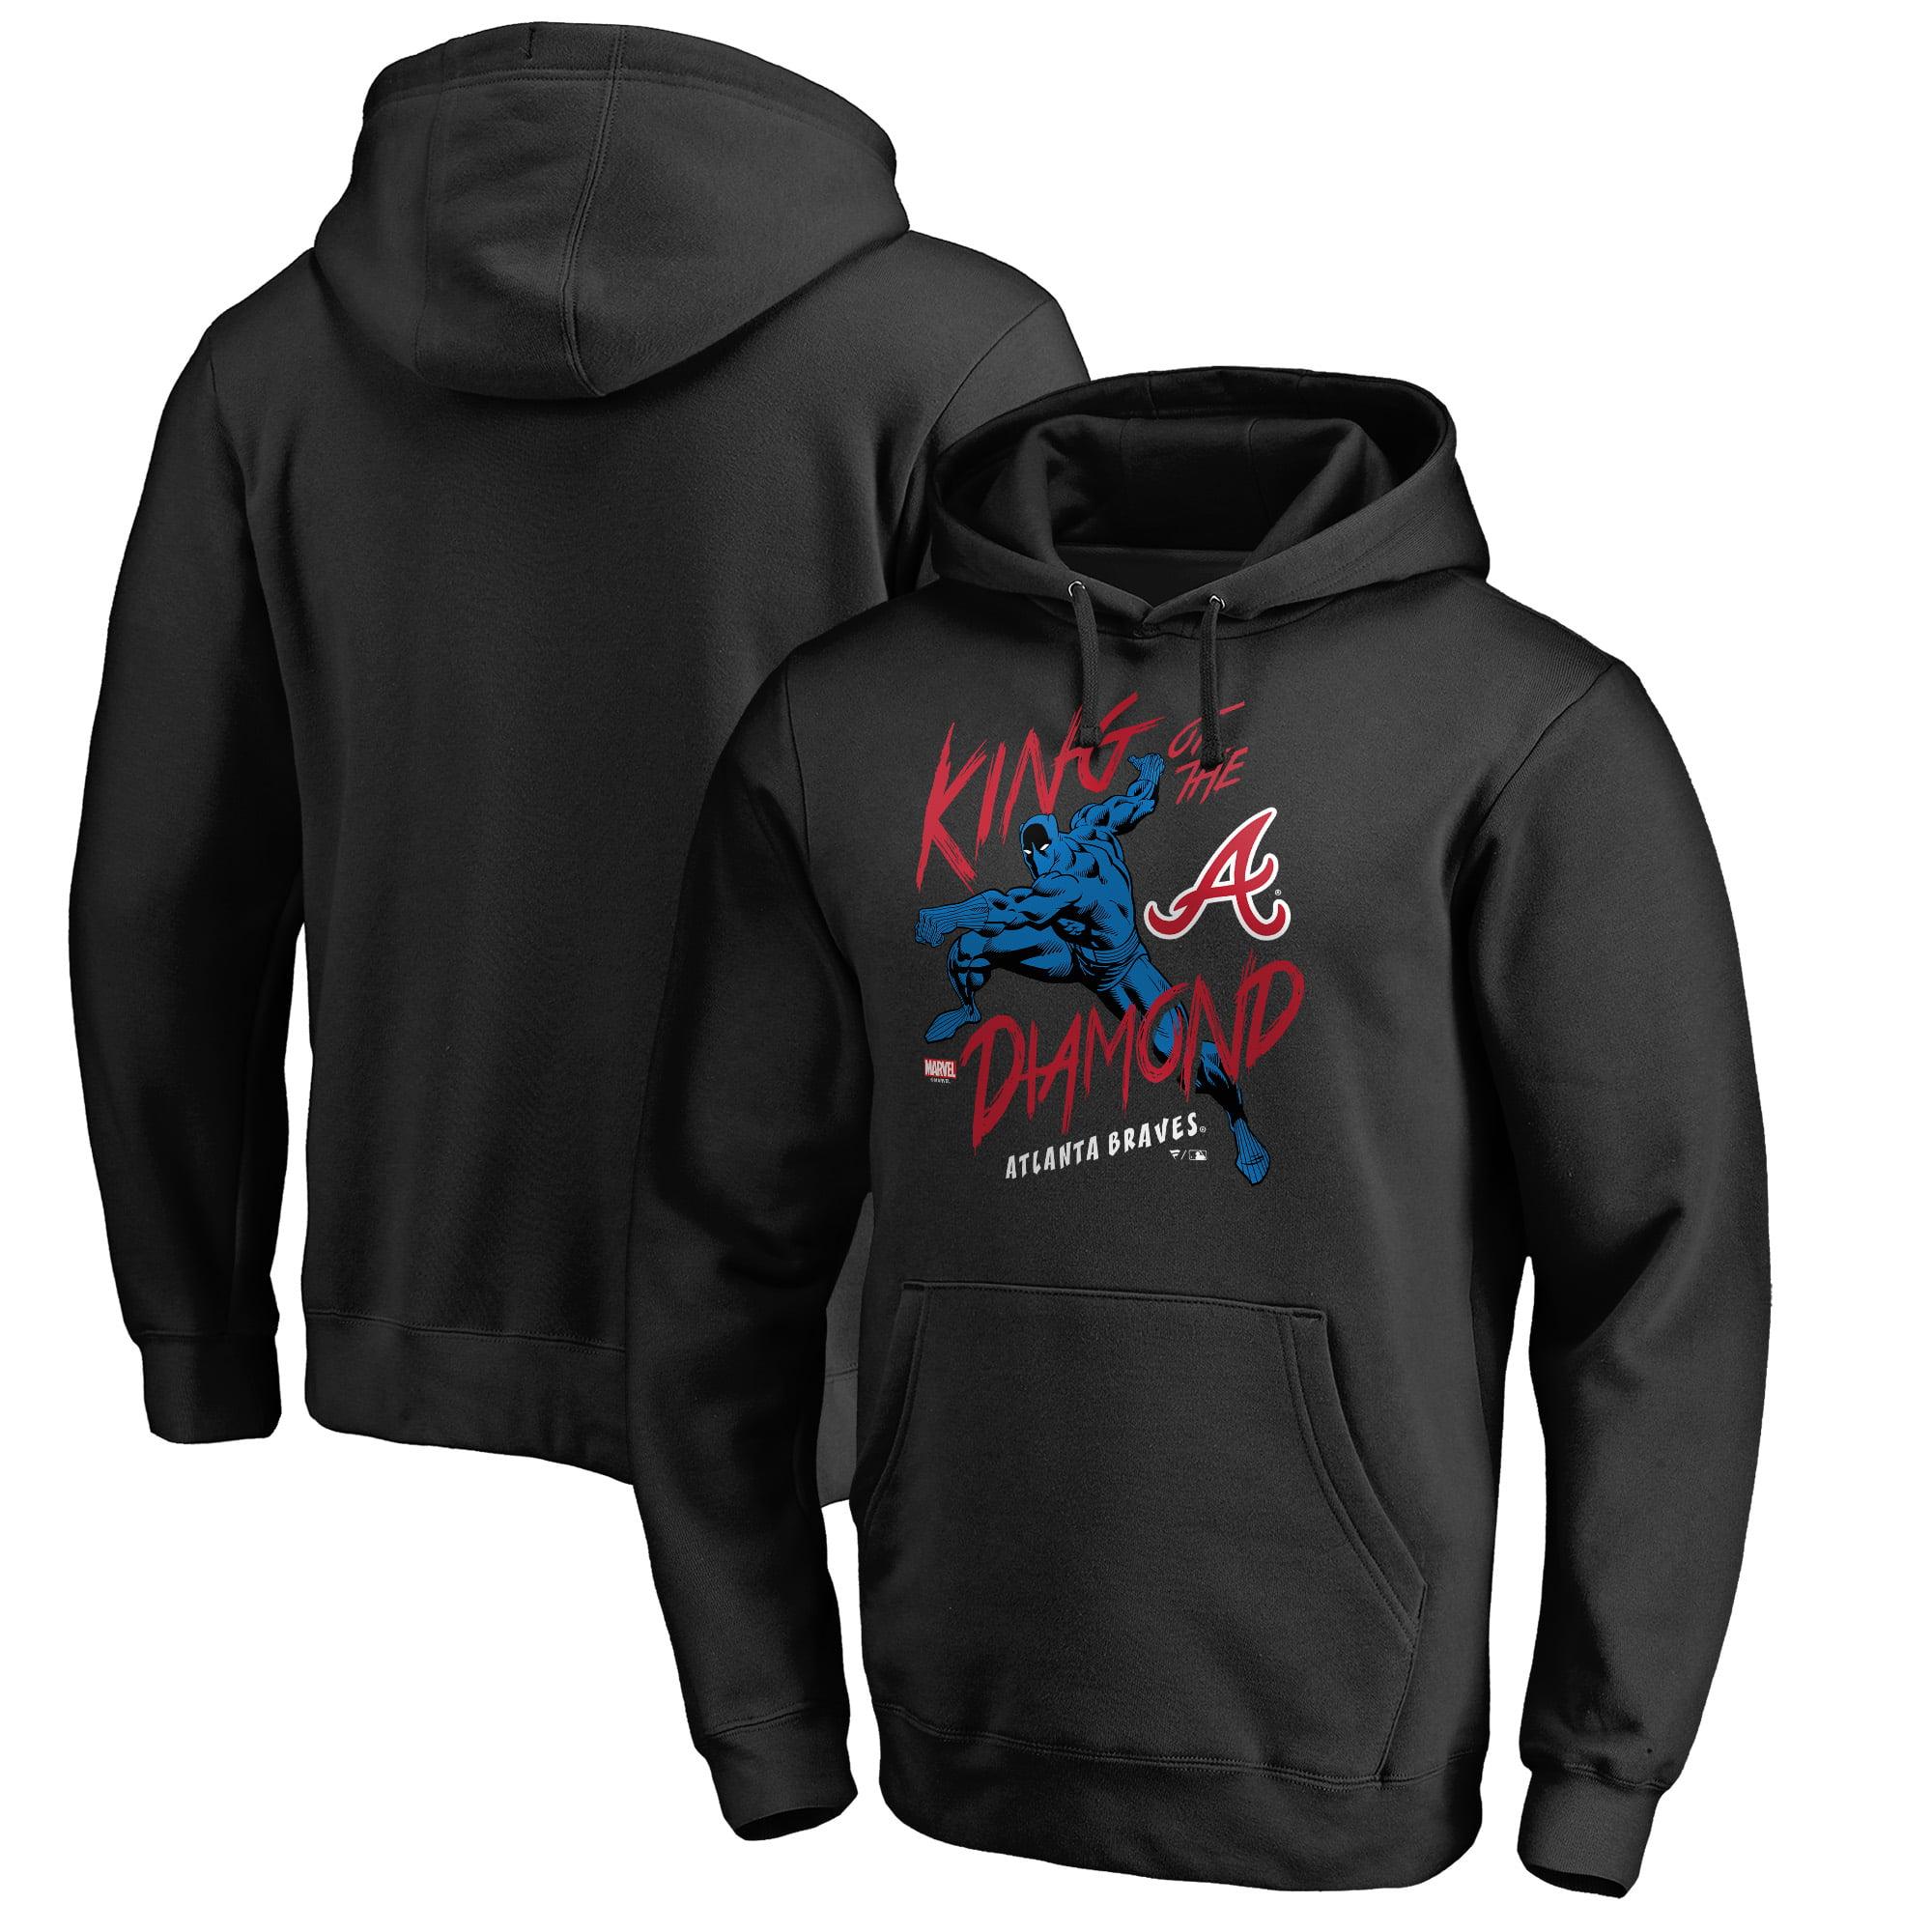 Atlanta Braves Fanatics Branded MLB Marvel Black Panther King of the Diamond Pullover Hoodie - Black